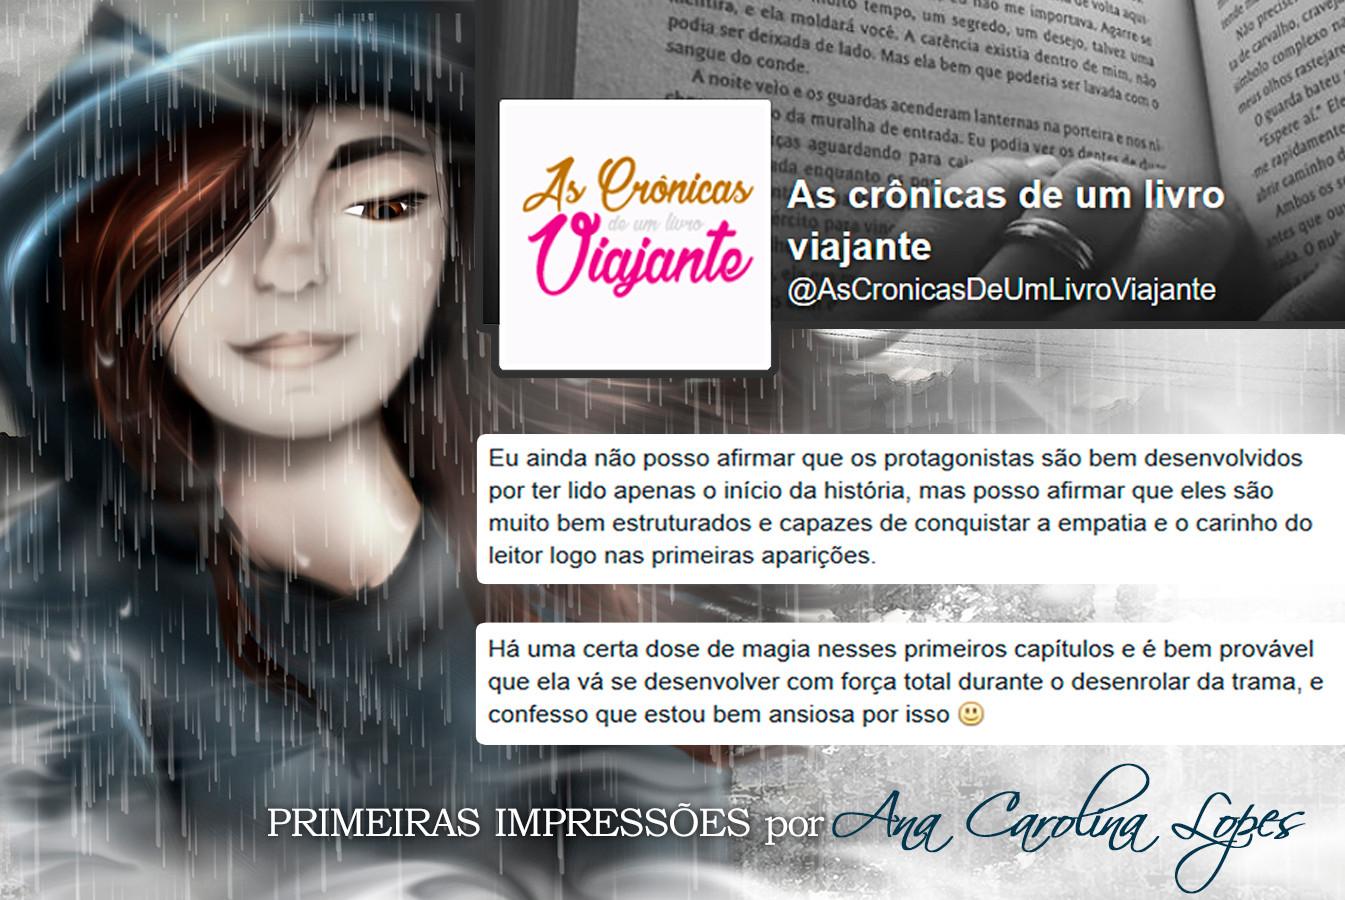 Livro viajante Ana Carolina.jpg